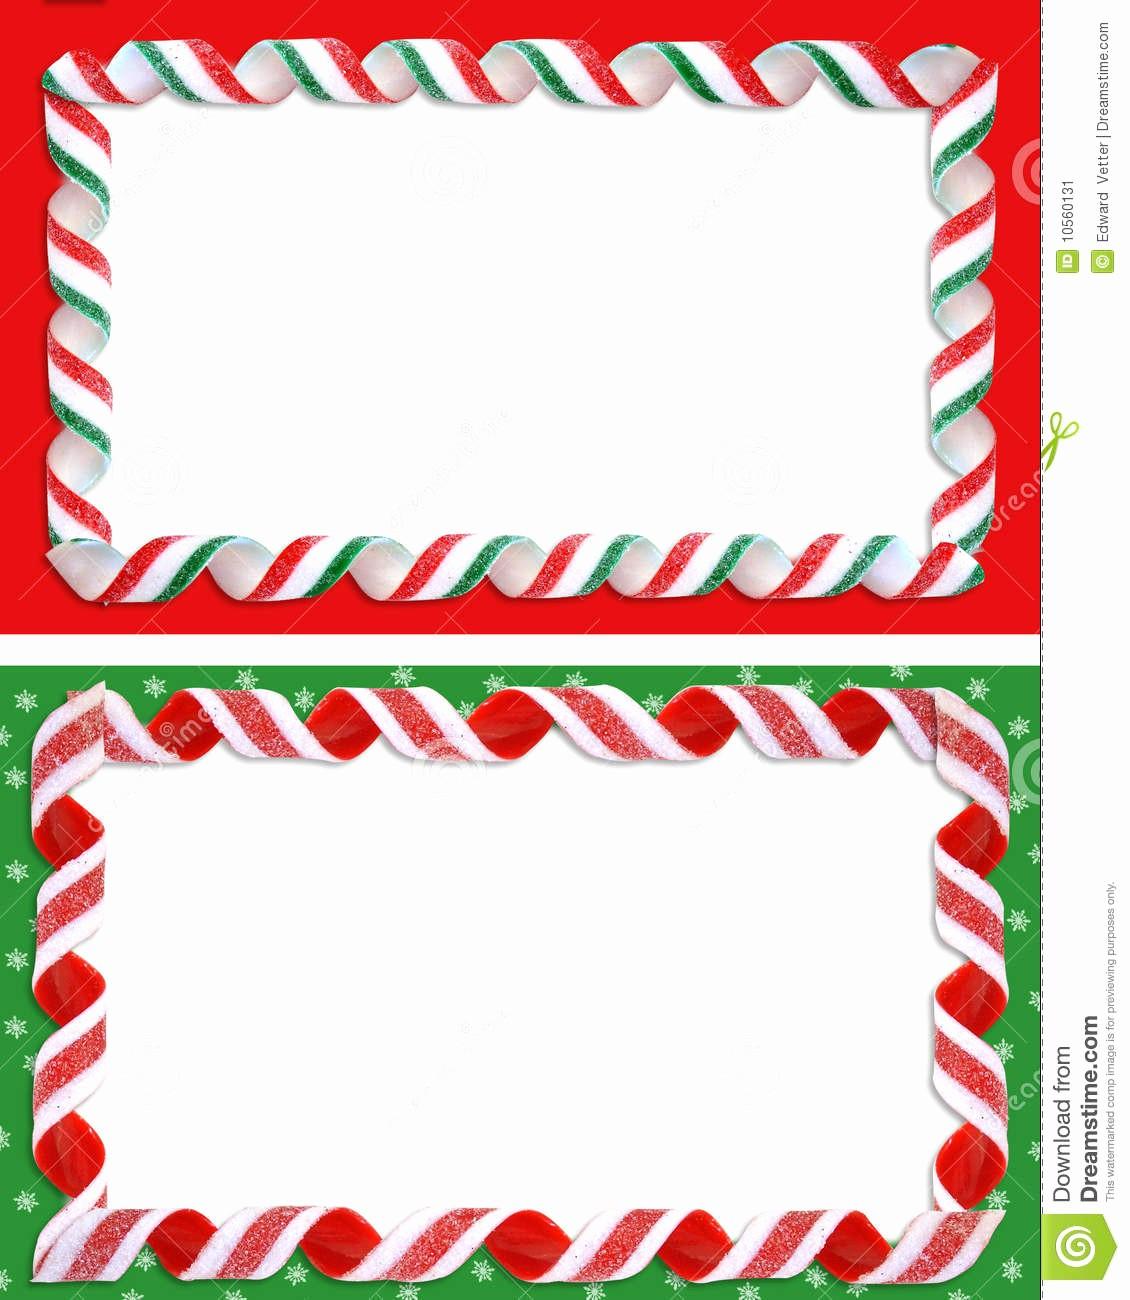 Free Printable Christmas Mailing Labels Elegant Christmas Labels Borders Blank Stock Illustration